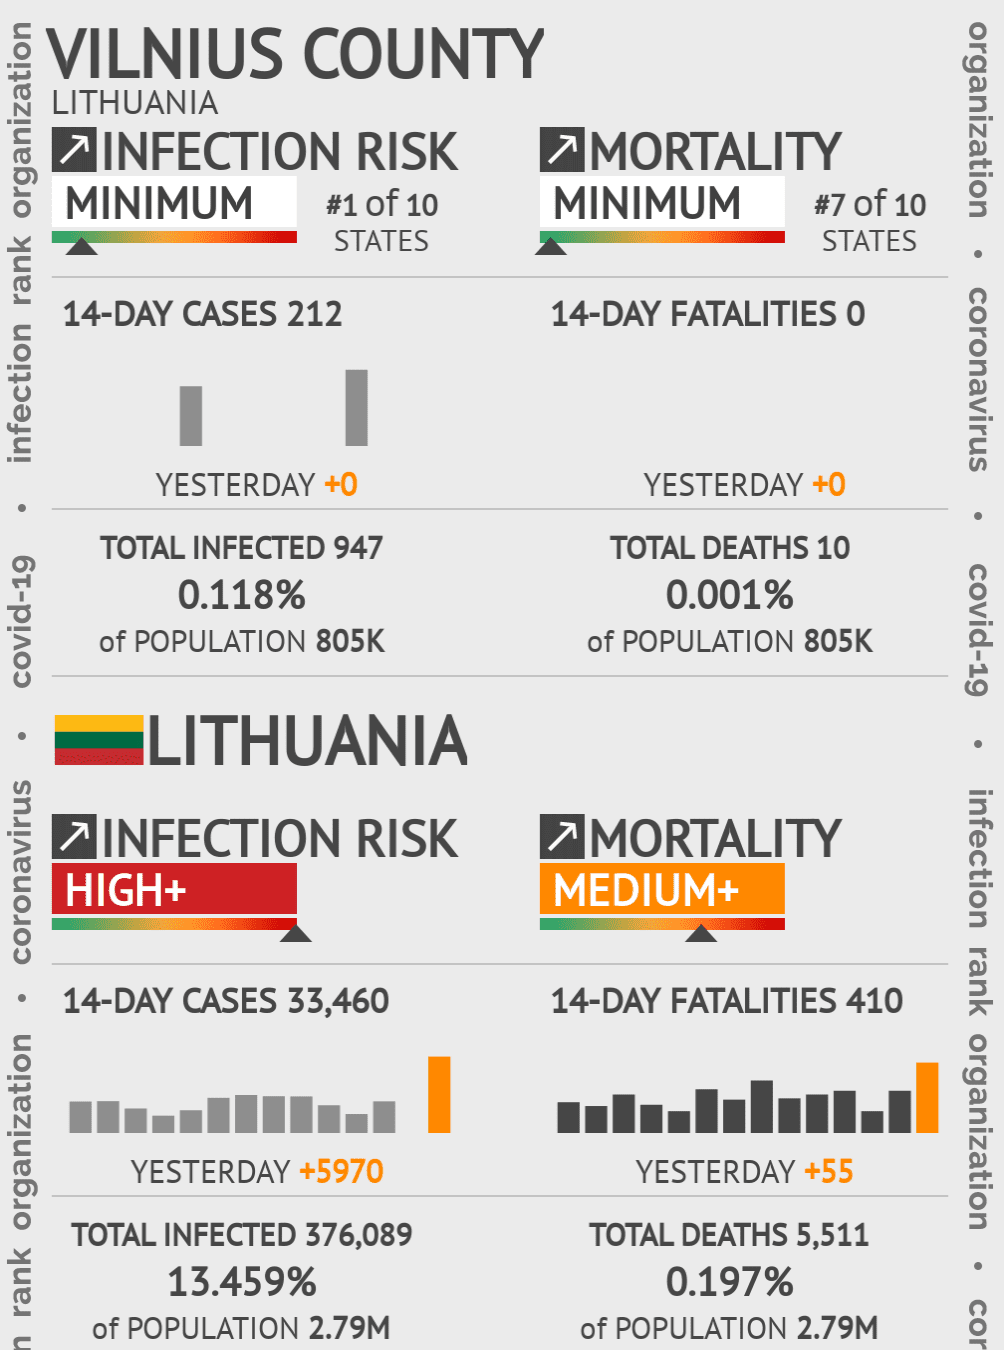 Vilnius County Coronavirus Covid-19 Risk of Infection on May 14, 2020